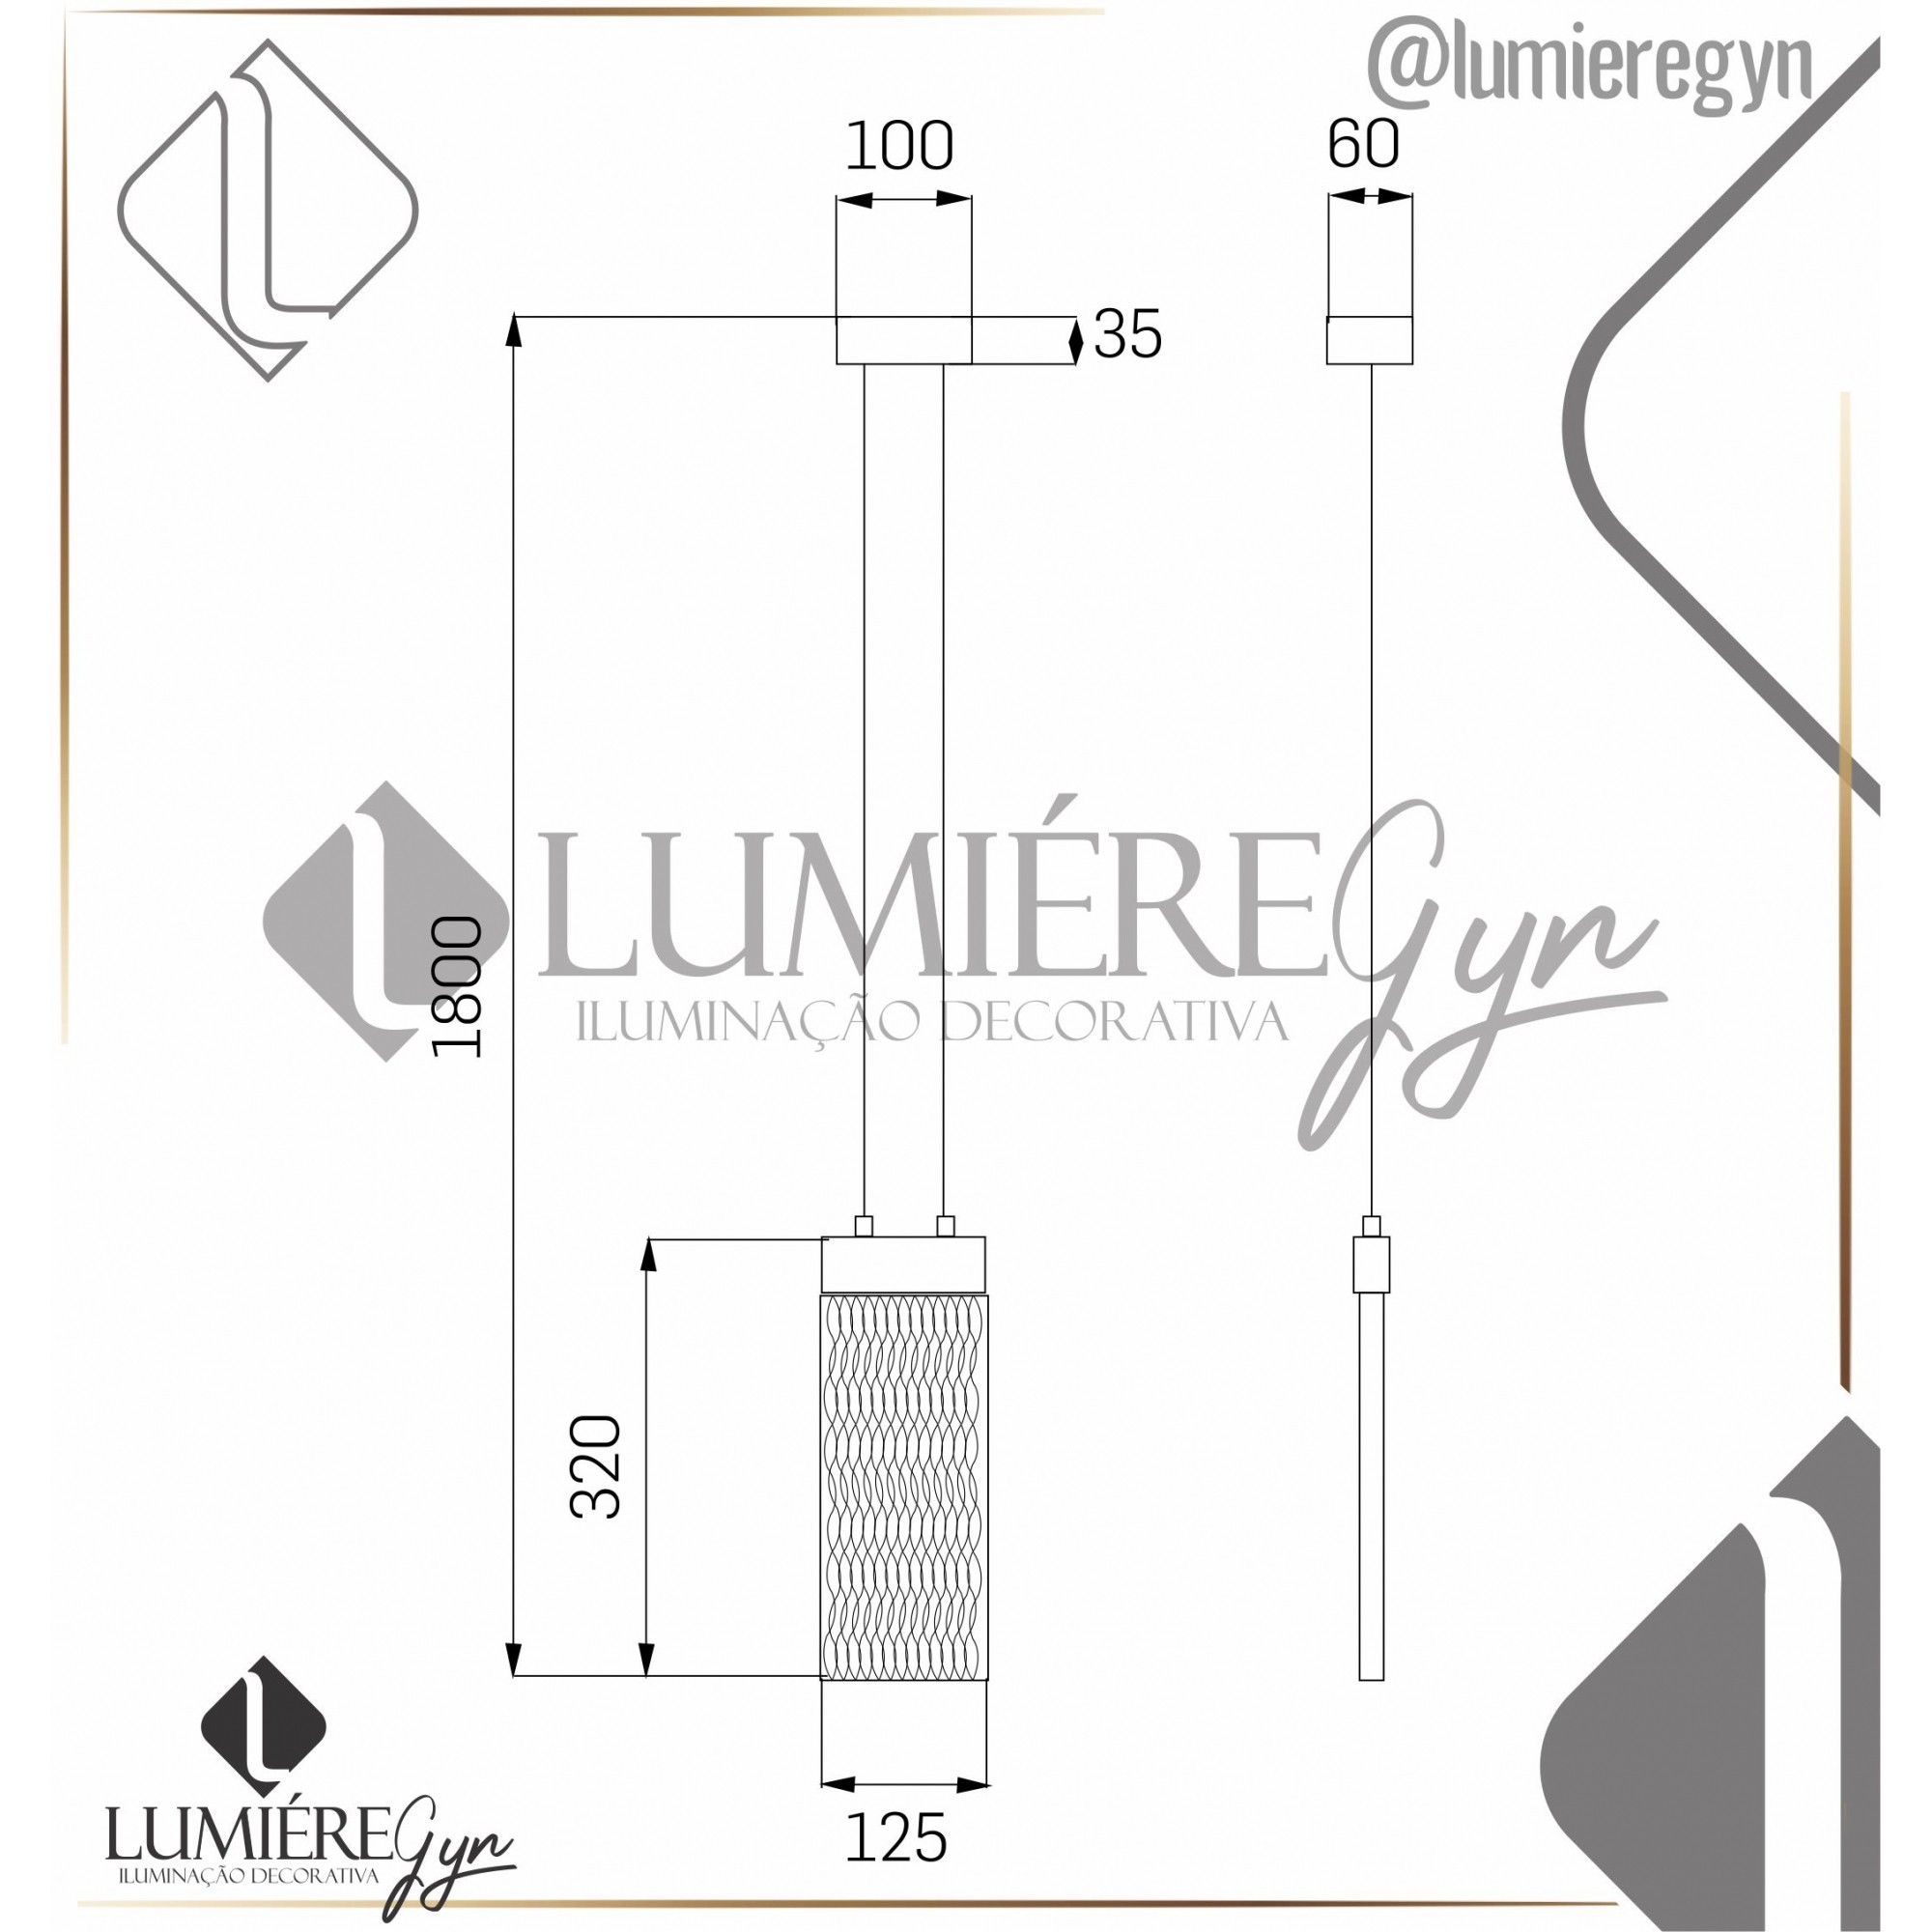 PENDENTE LACTITE G LED 4W 400LM 3000K  VIDRO CRAQUELE DOURADO STUDIOLUCE PD1413